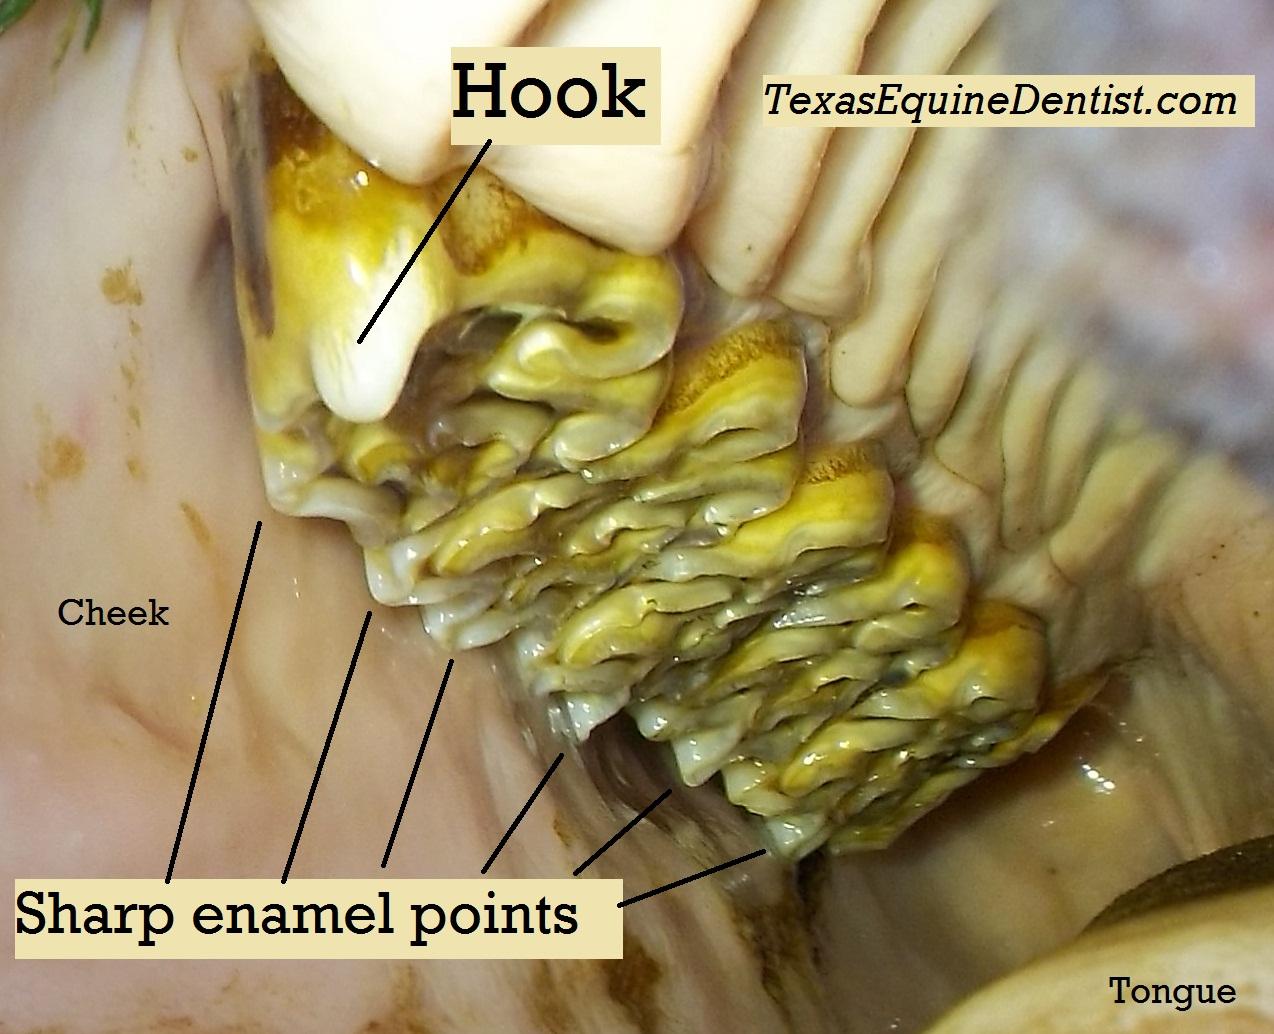 equine dental case studies